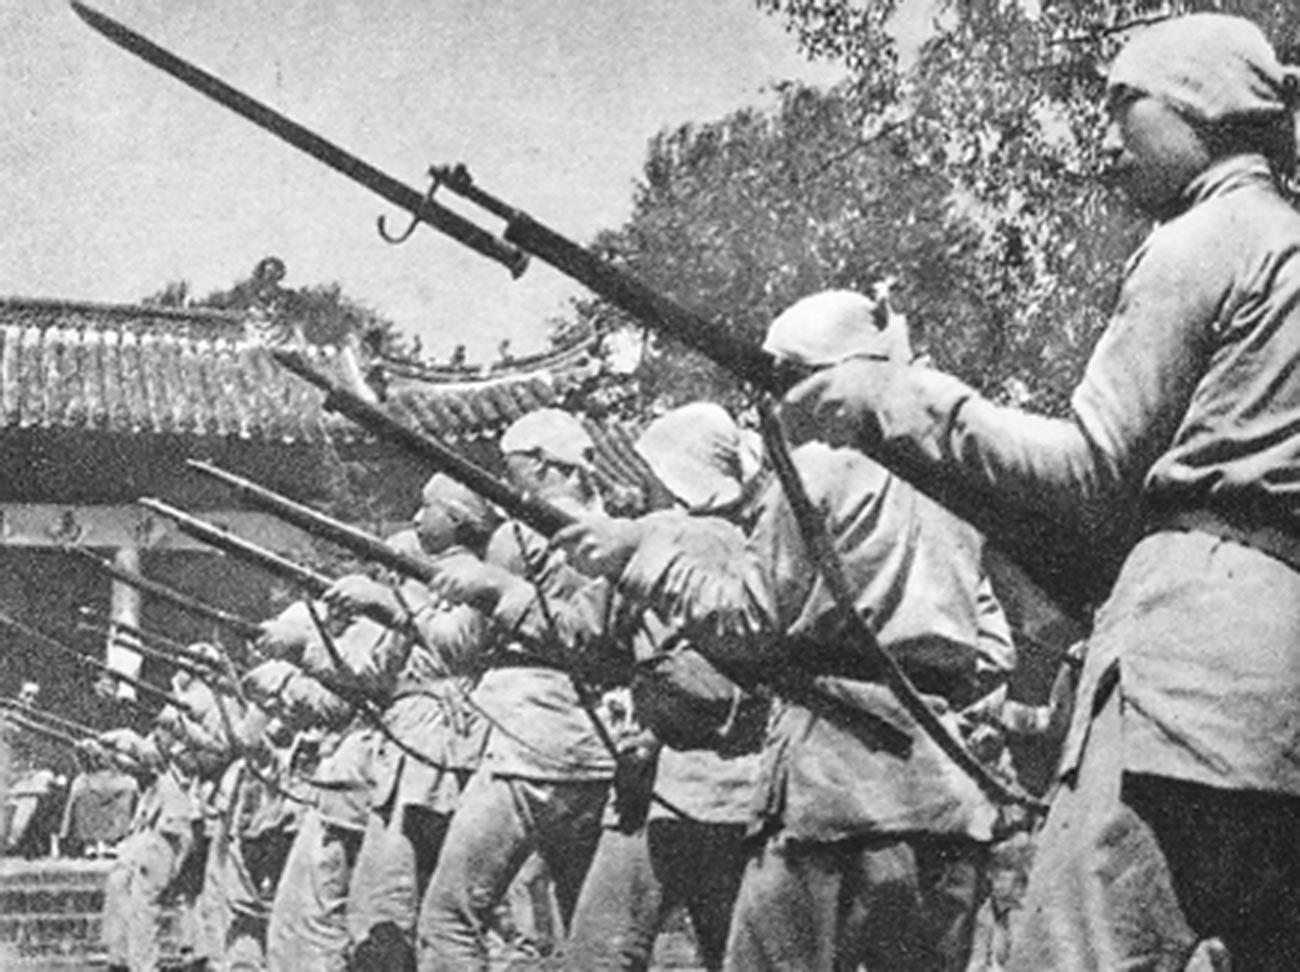 Tentara Hui Tiongkok pimpinan Ma Benzhai, seorang anggota Partai Komunis.